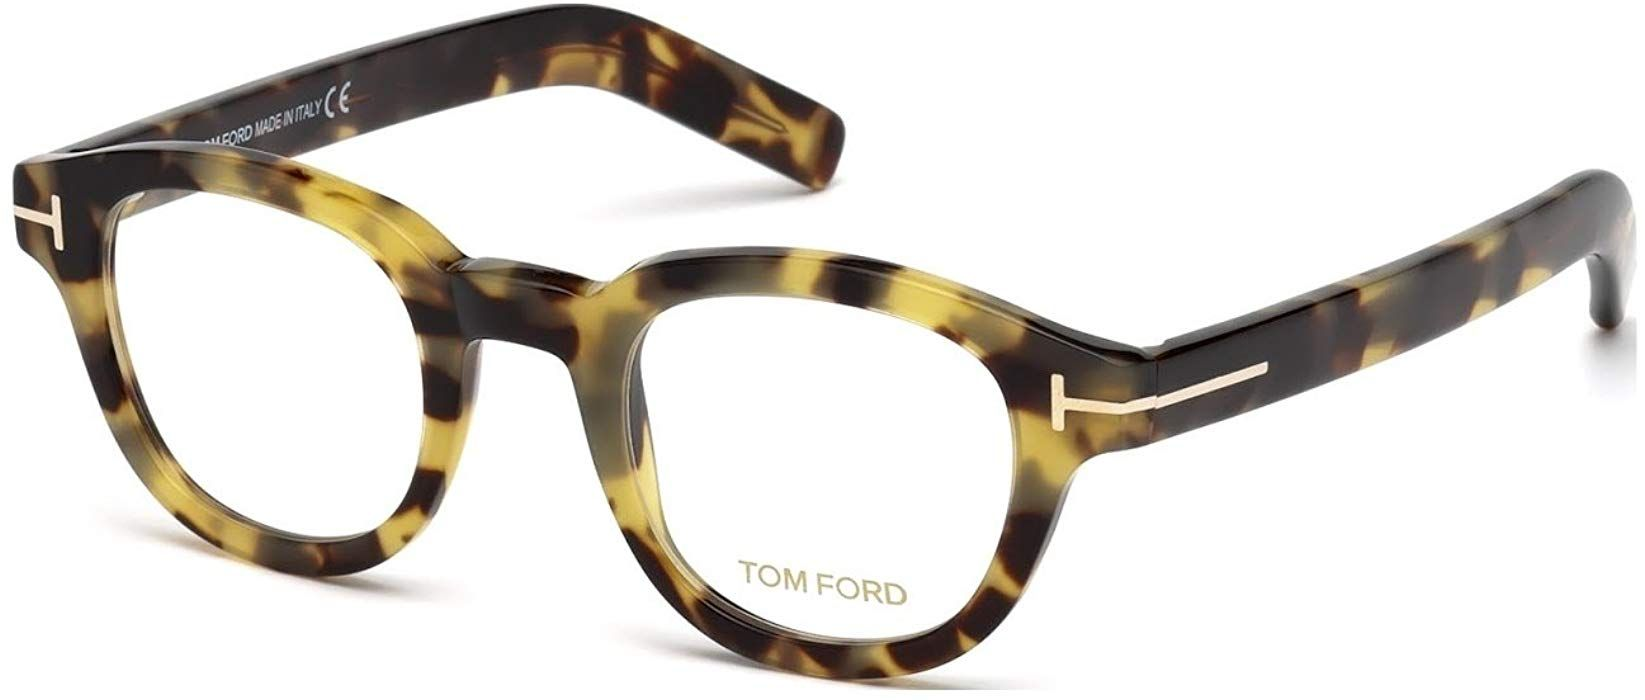 4ea2e31c0f Eyeglasses Tom Ford FT 5429 055 coloured havana at Amazon Men s Clothing  store